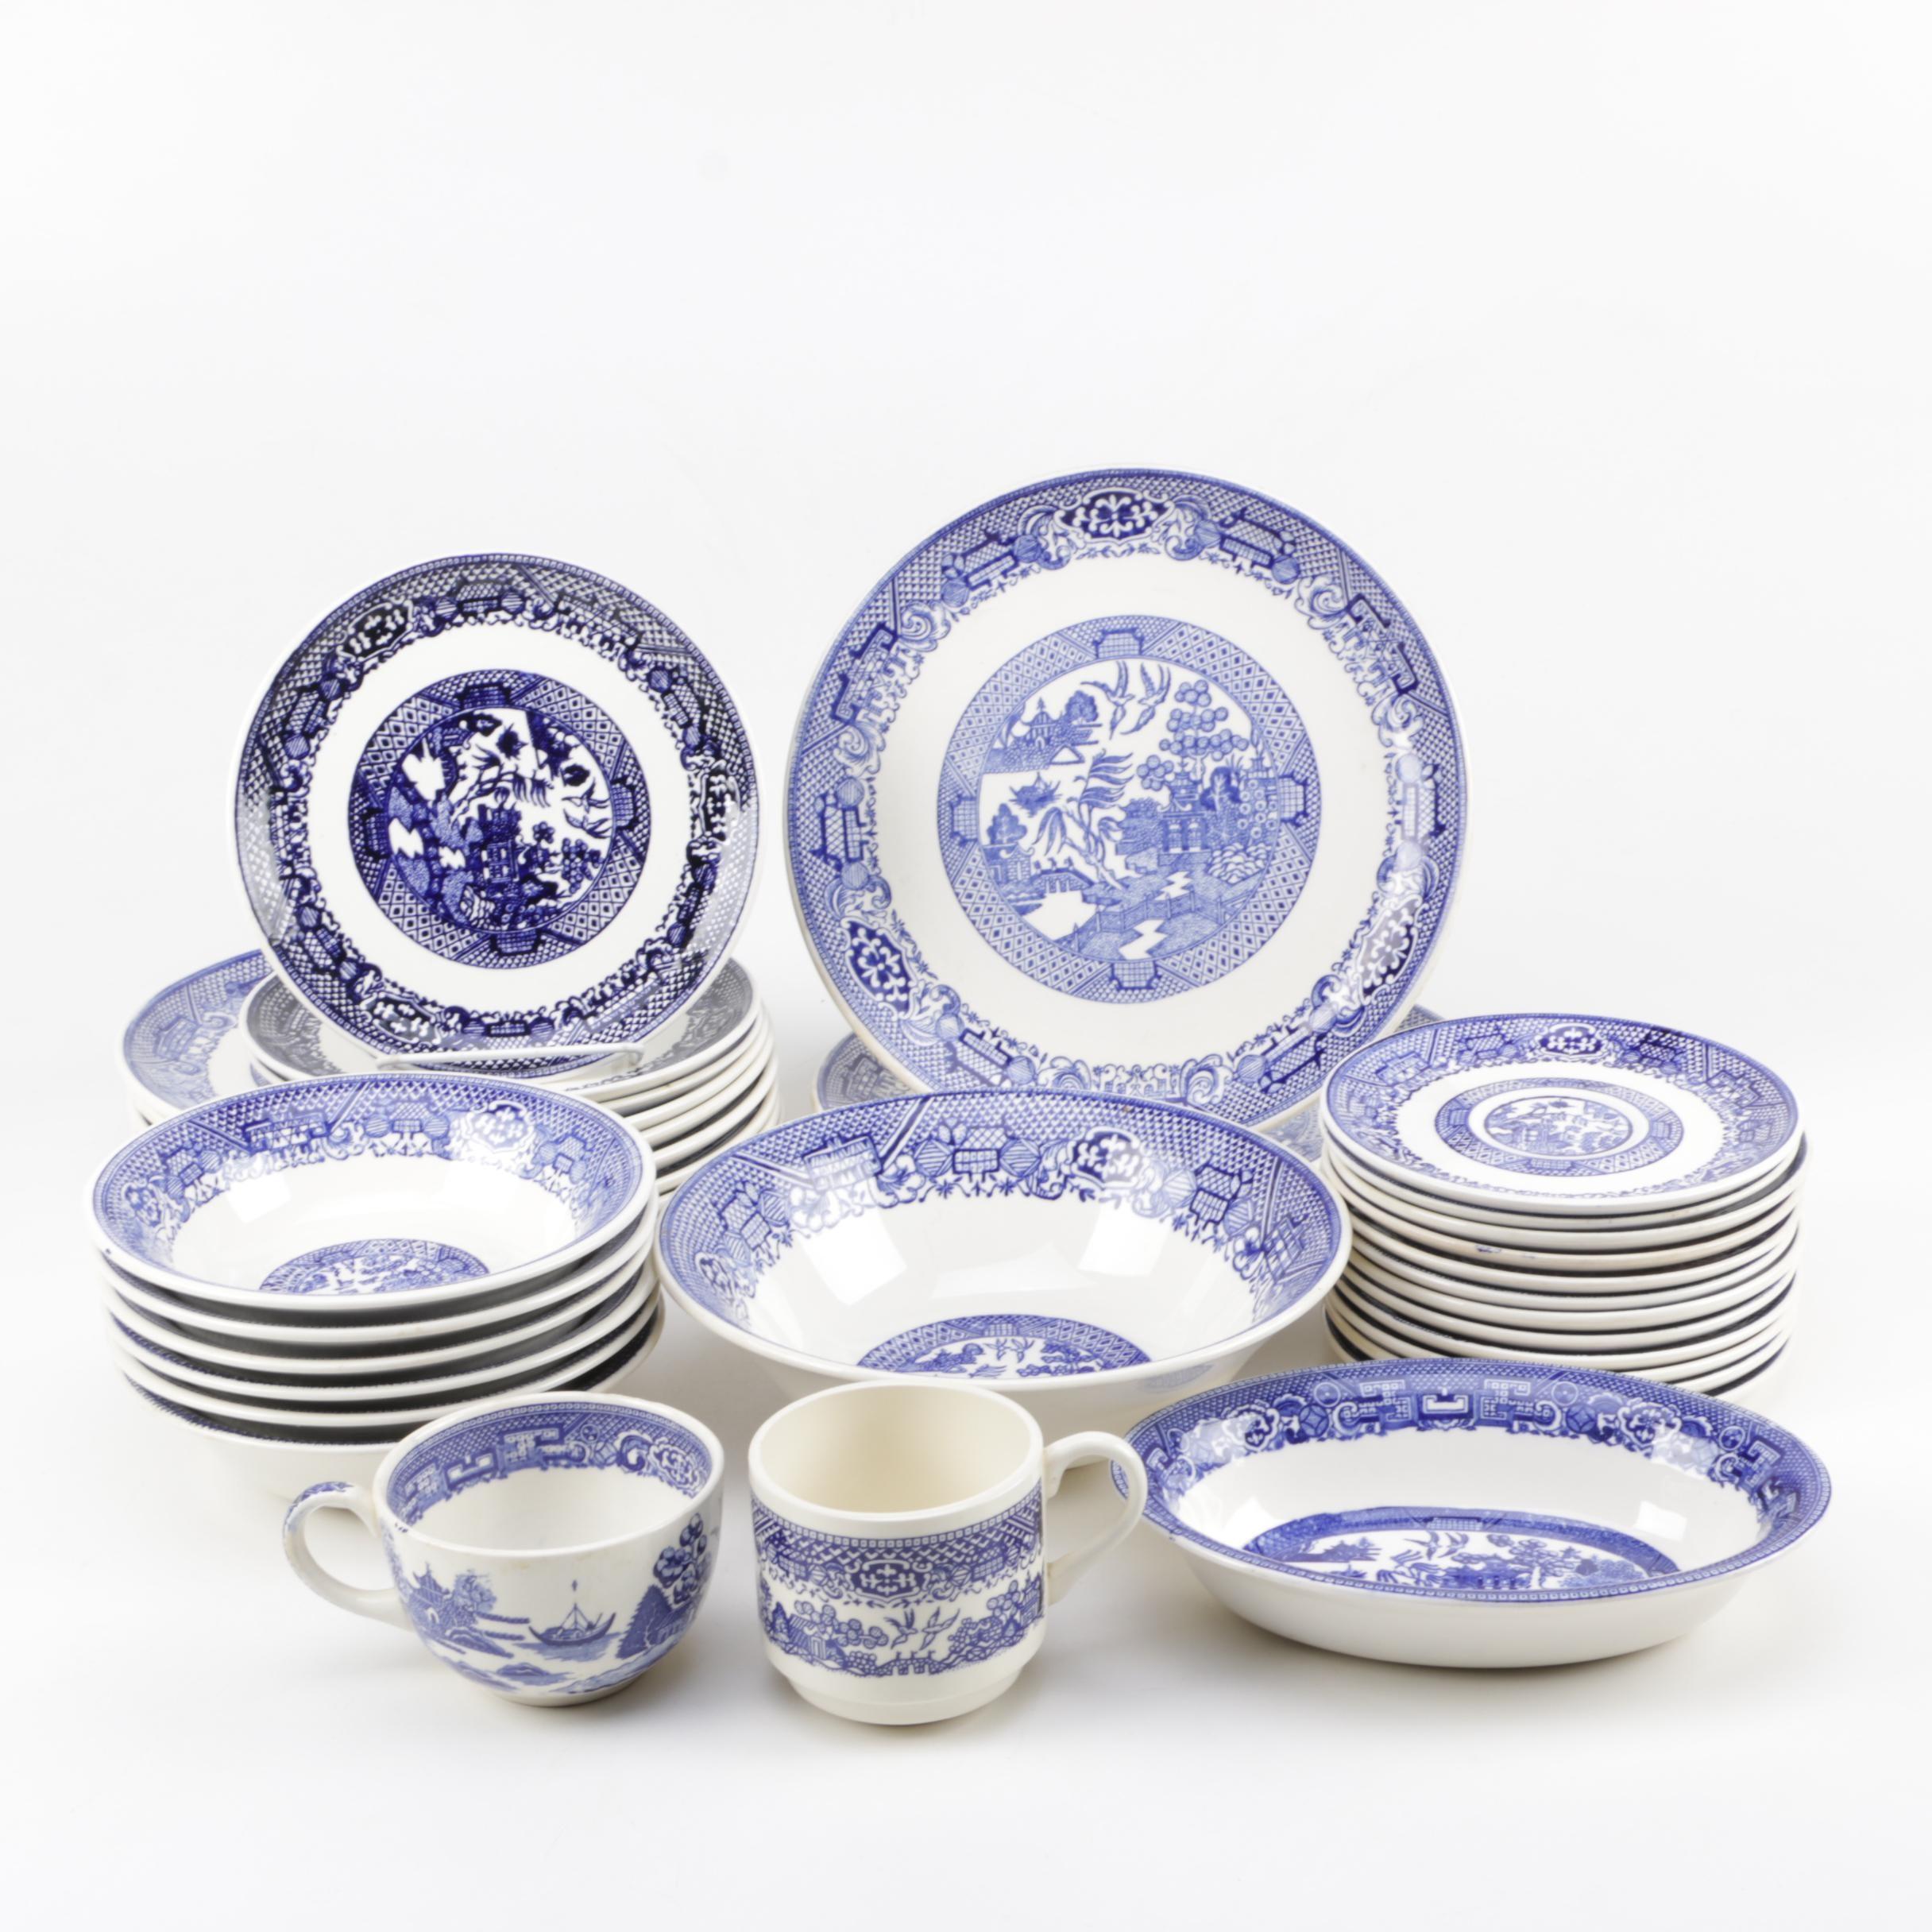 Assorted Blue Willow Dinnerware